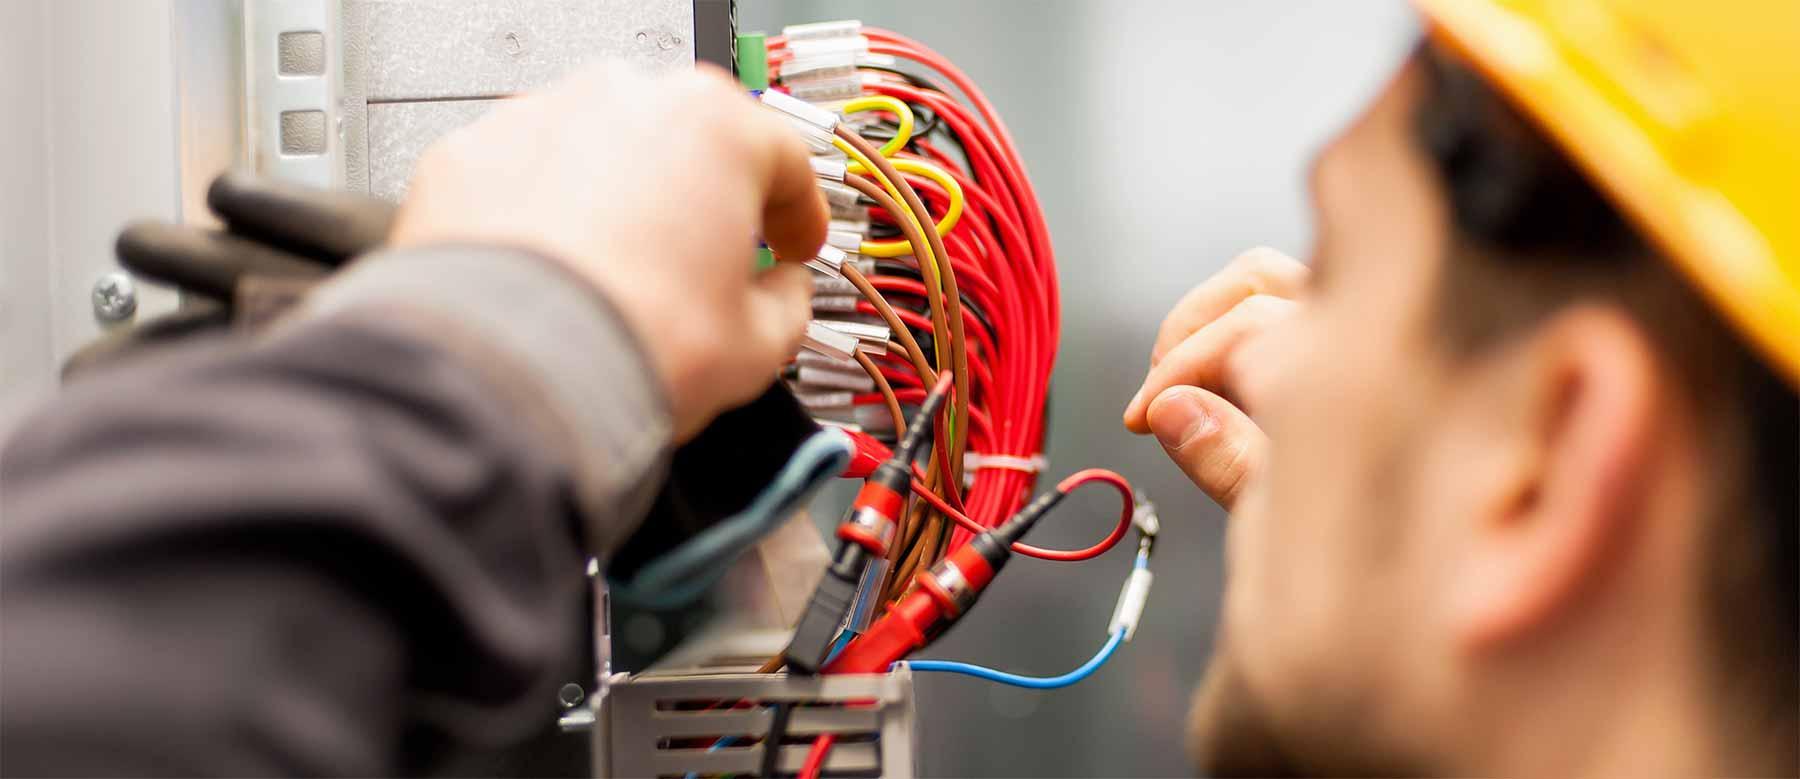 Trades College Australia - Electrotechnology Cert III